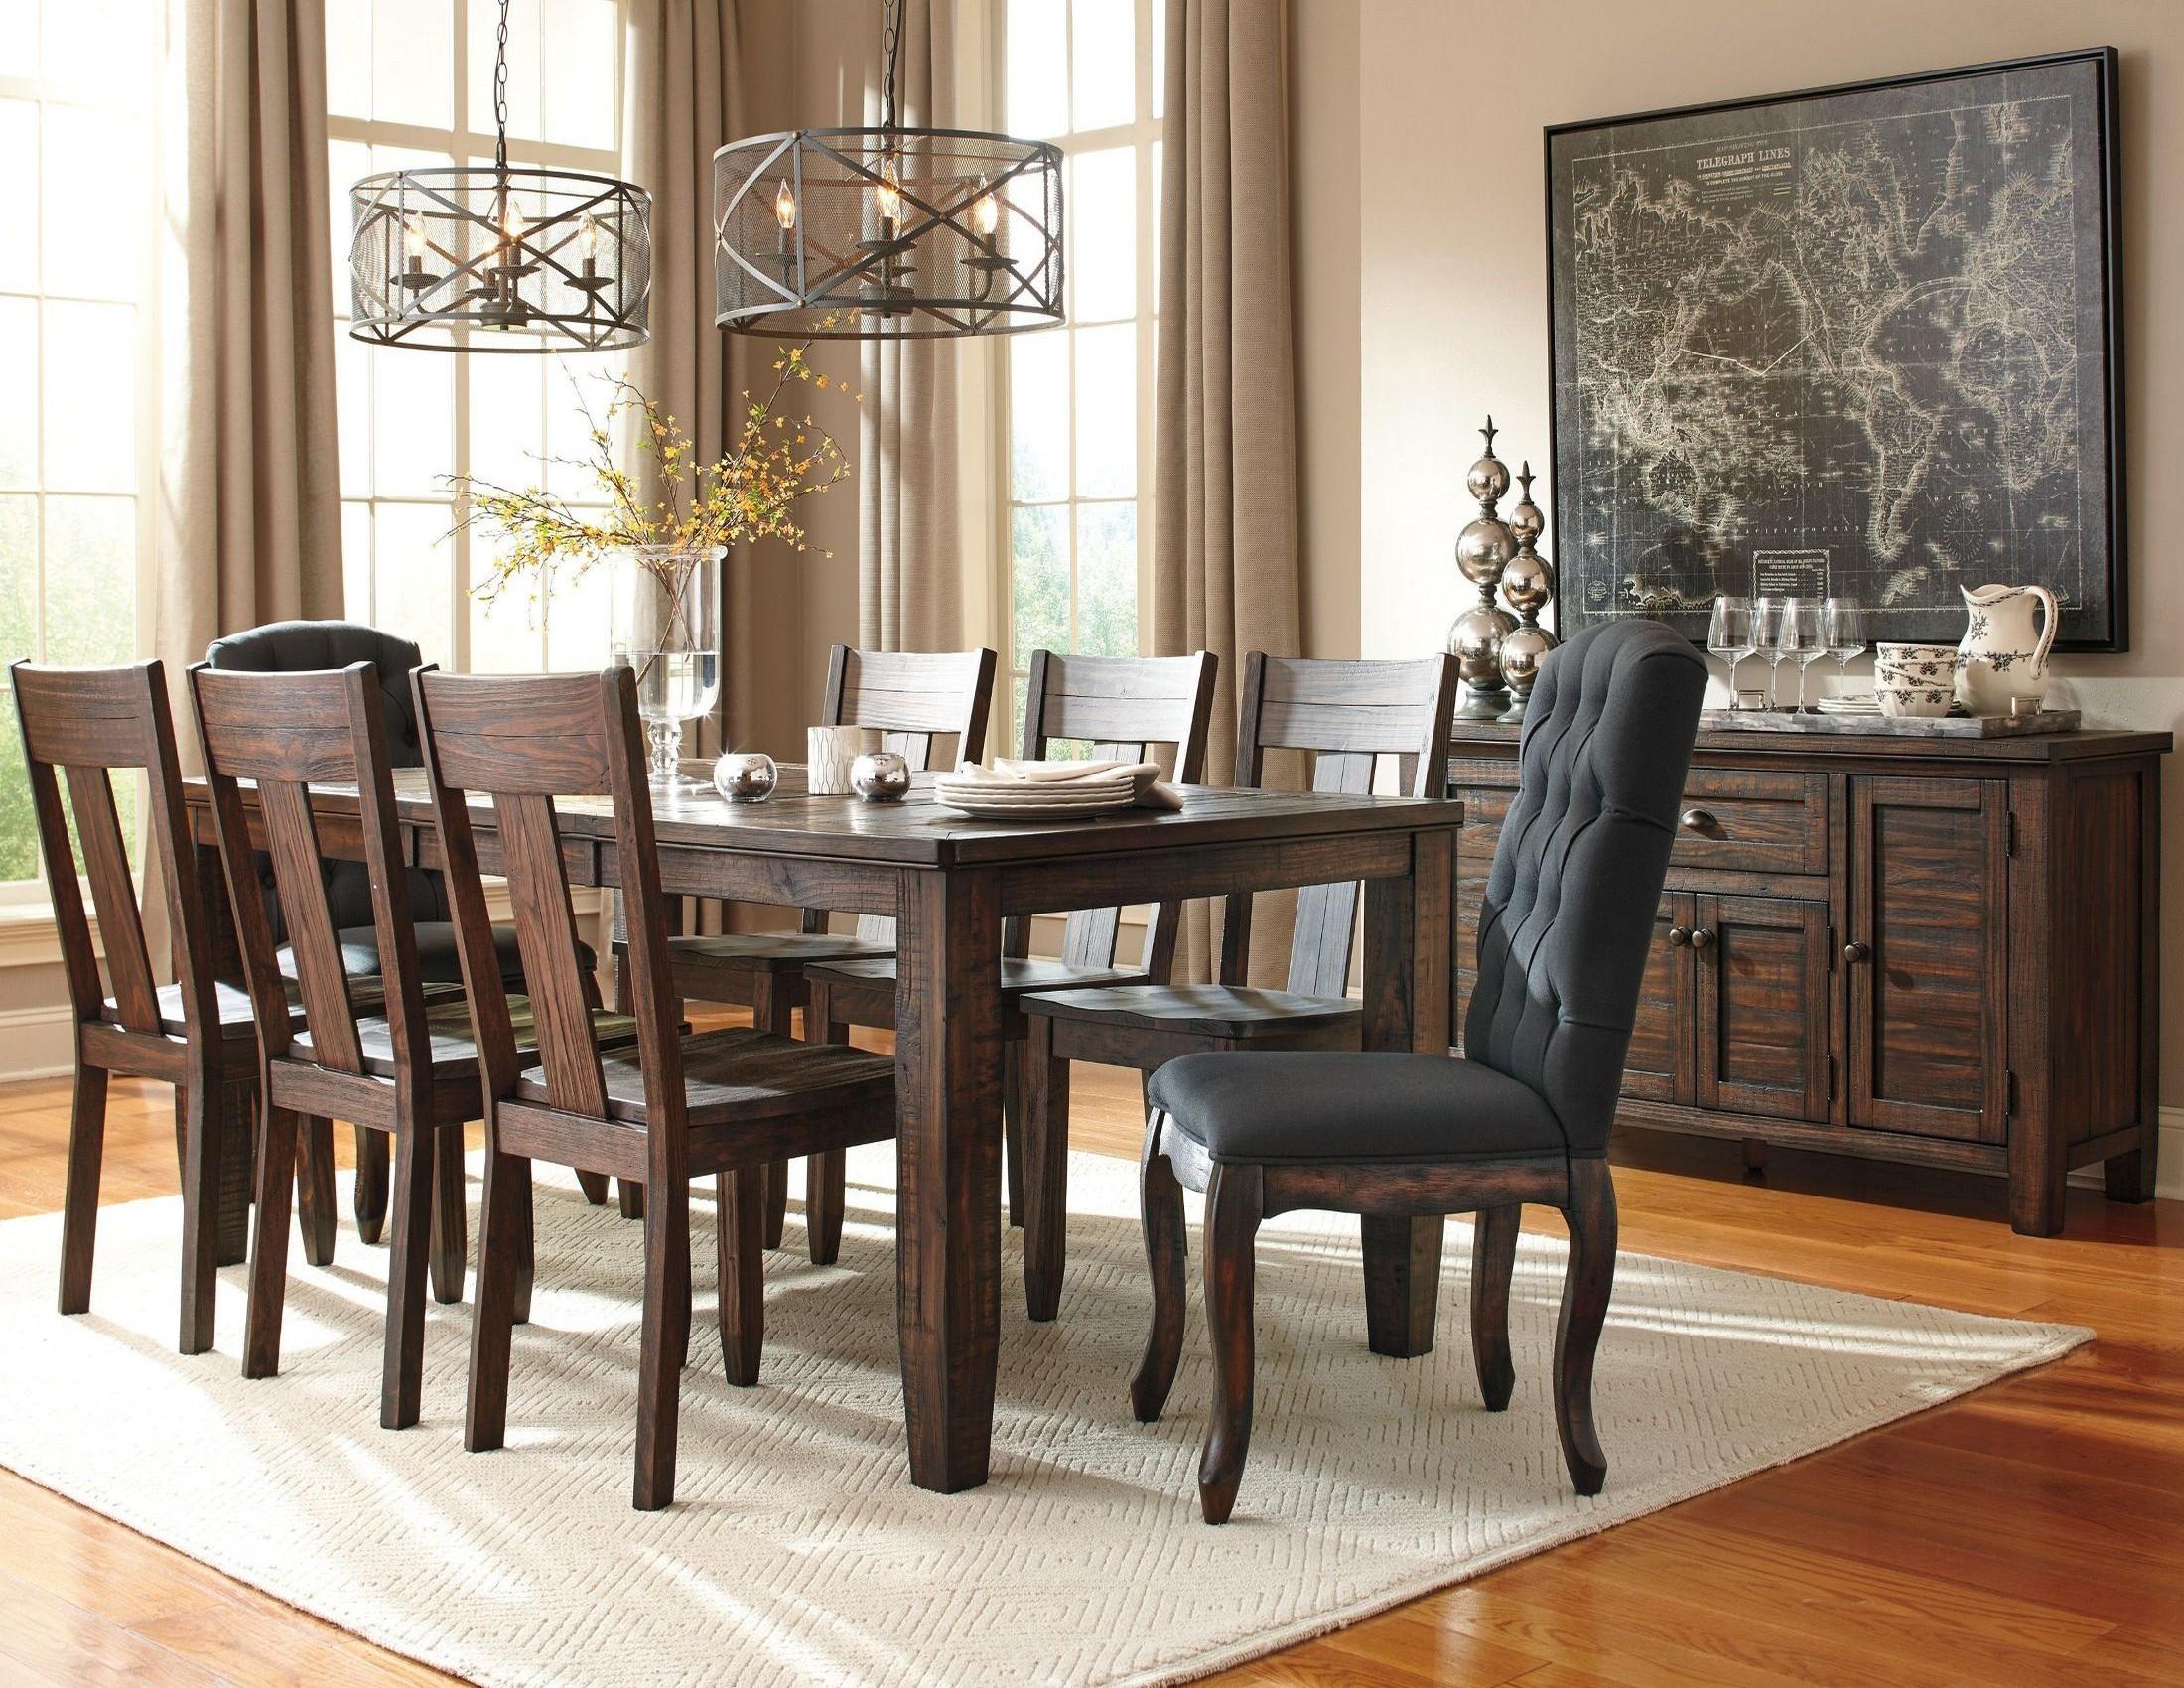 trudell dark brown rectangular extendable dining room set from ashley d658 35 coleman furniture. Black Bedroom Furniture Sets. Home Design Ideas